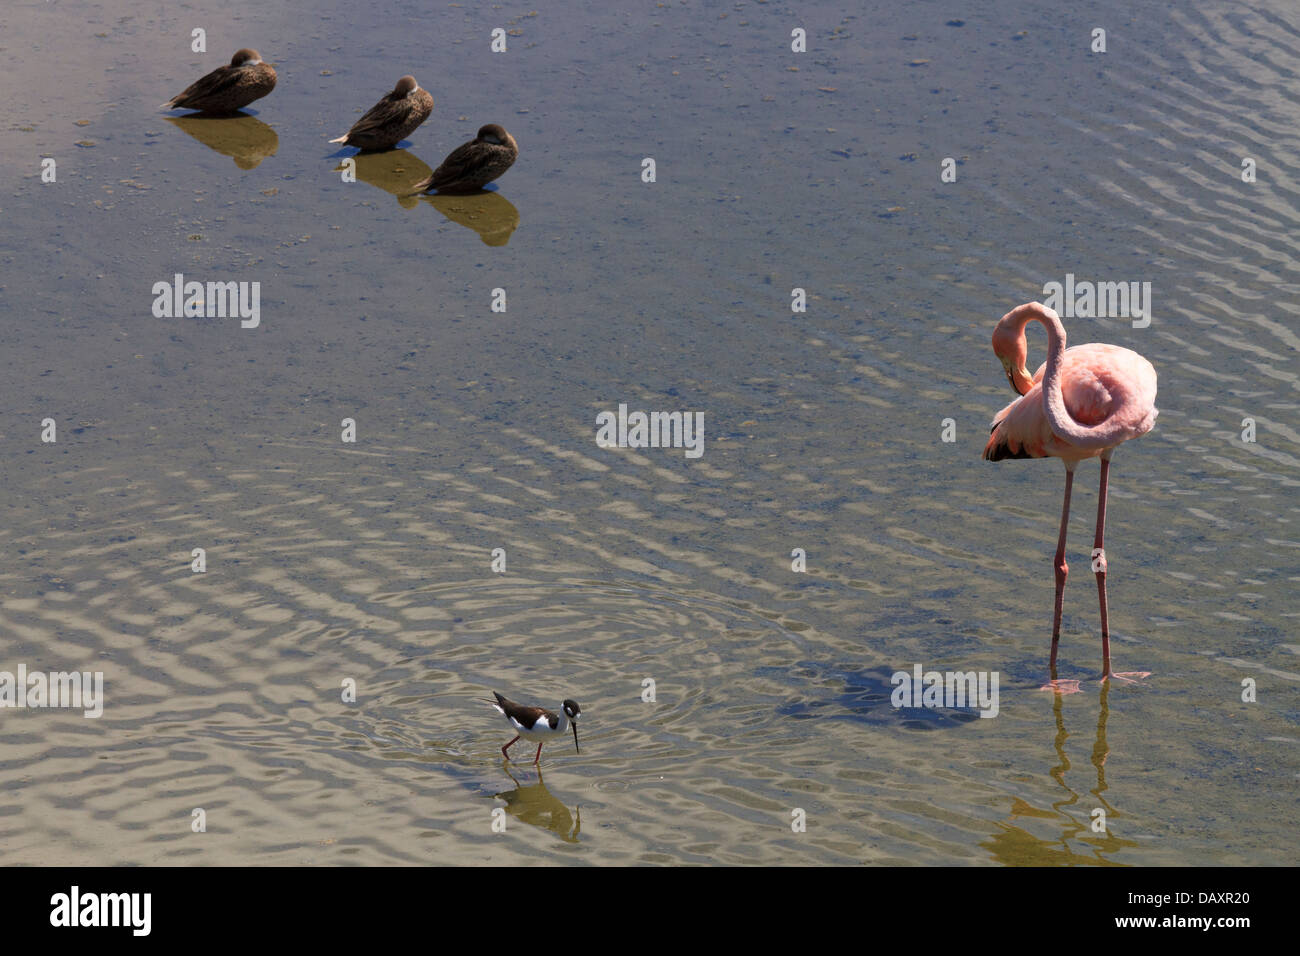 Flamingos, Phoenicopterus ruber, Saltwater Lagoon, Isabela Island, Galapagos Islands, Ecuador - Stock Image